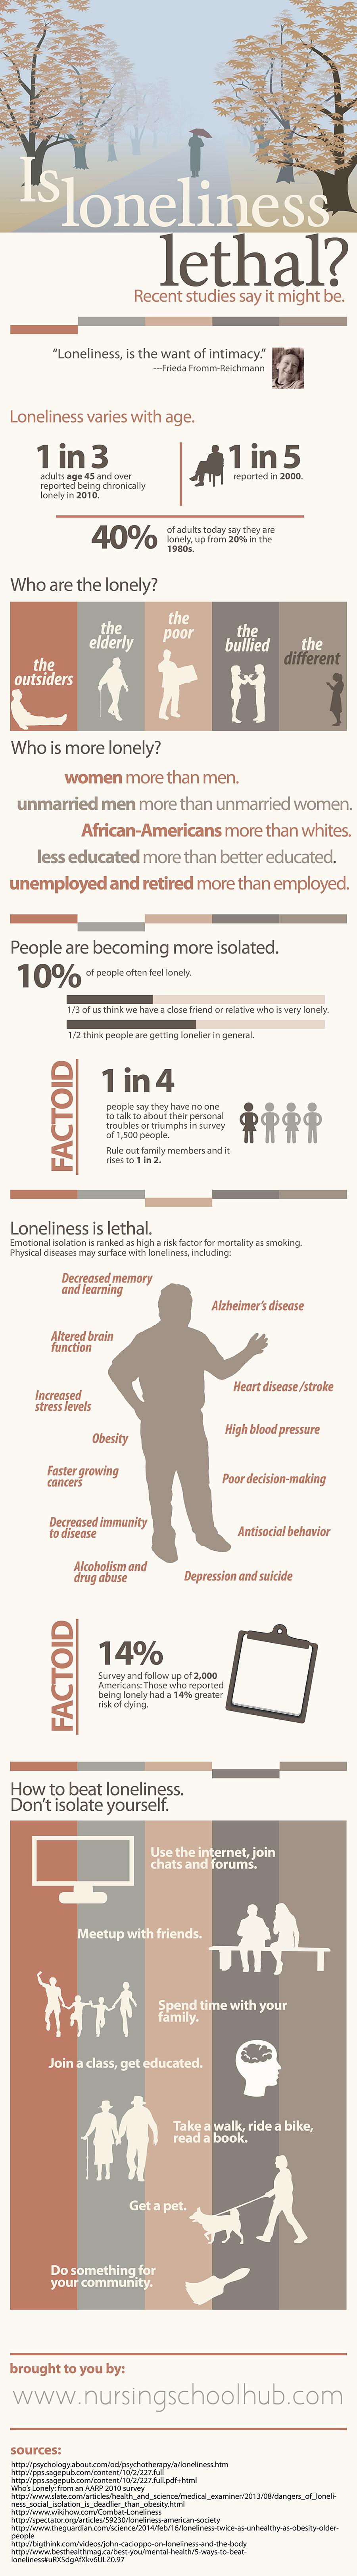 loneliness infographic